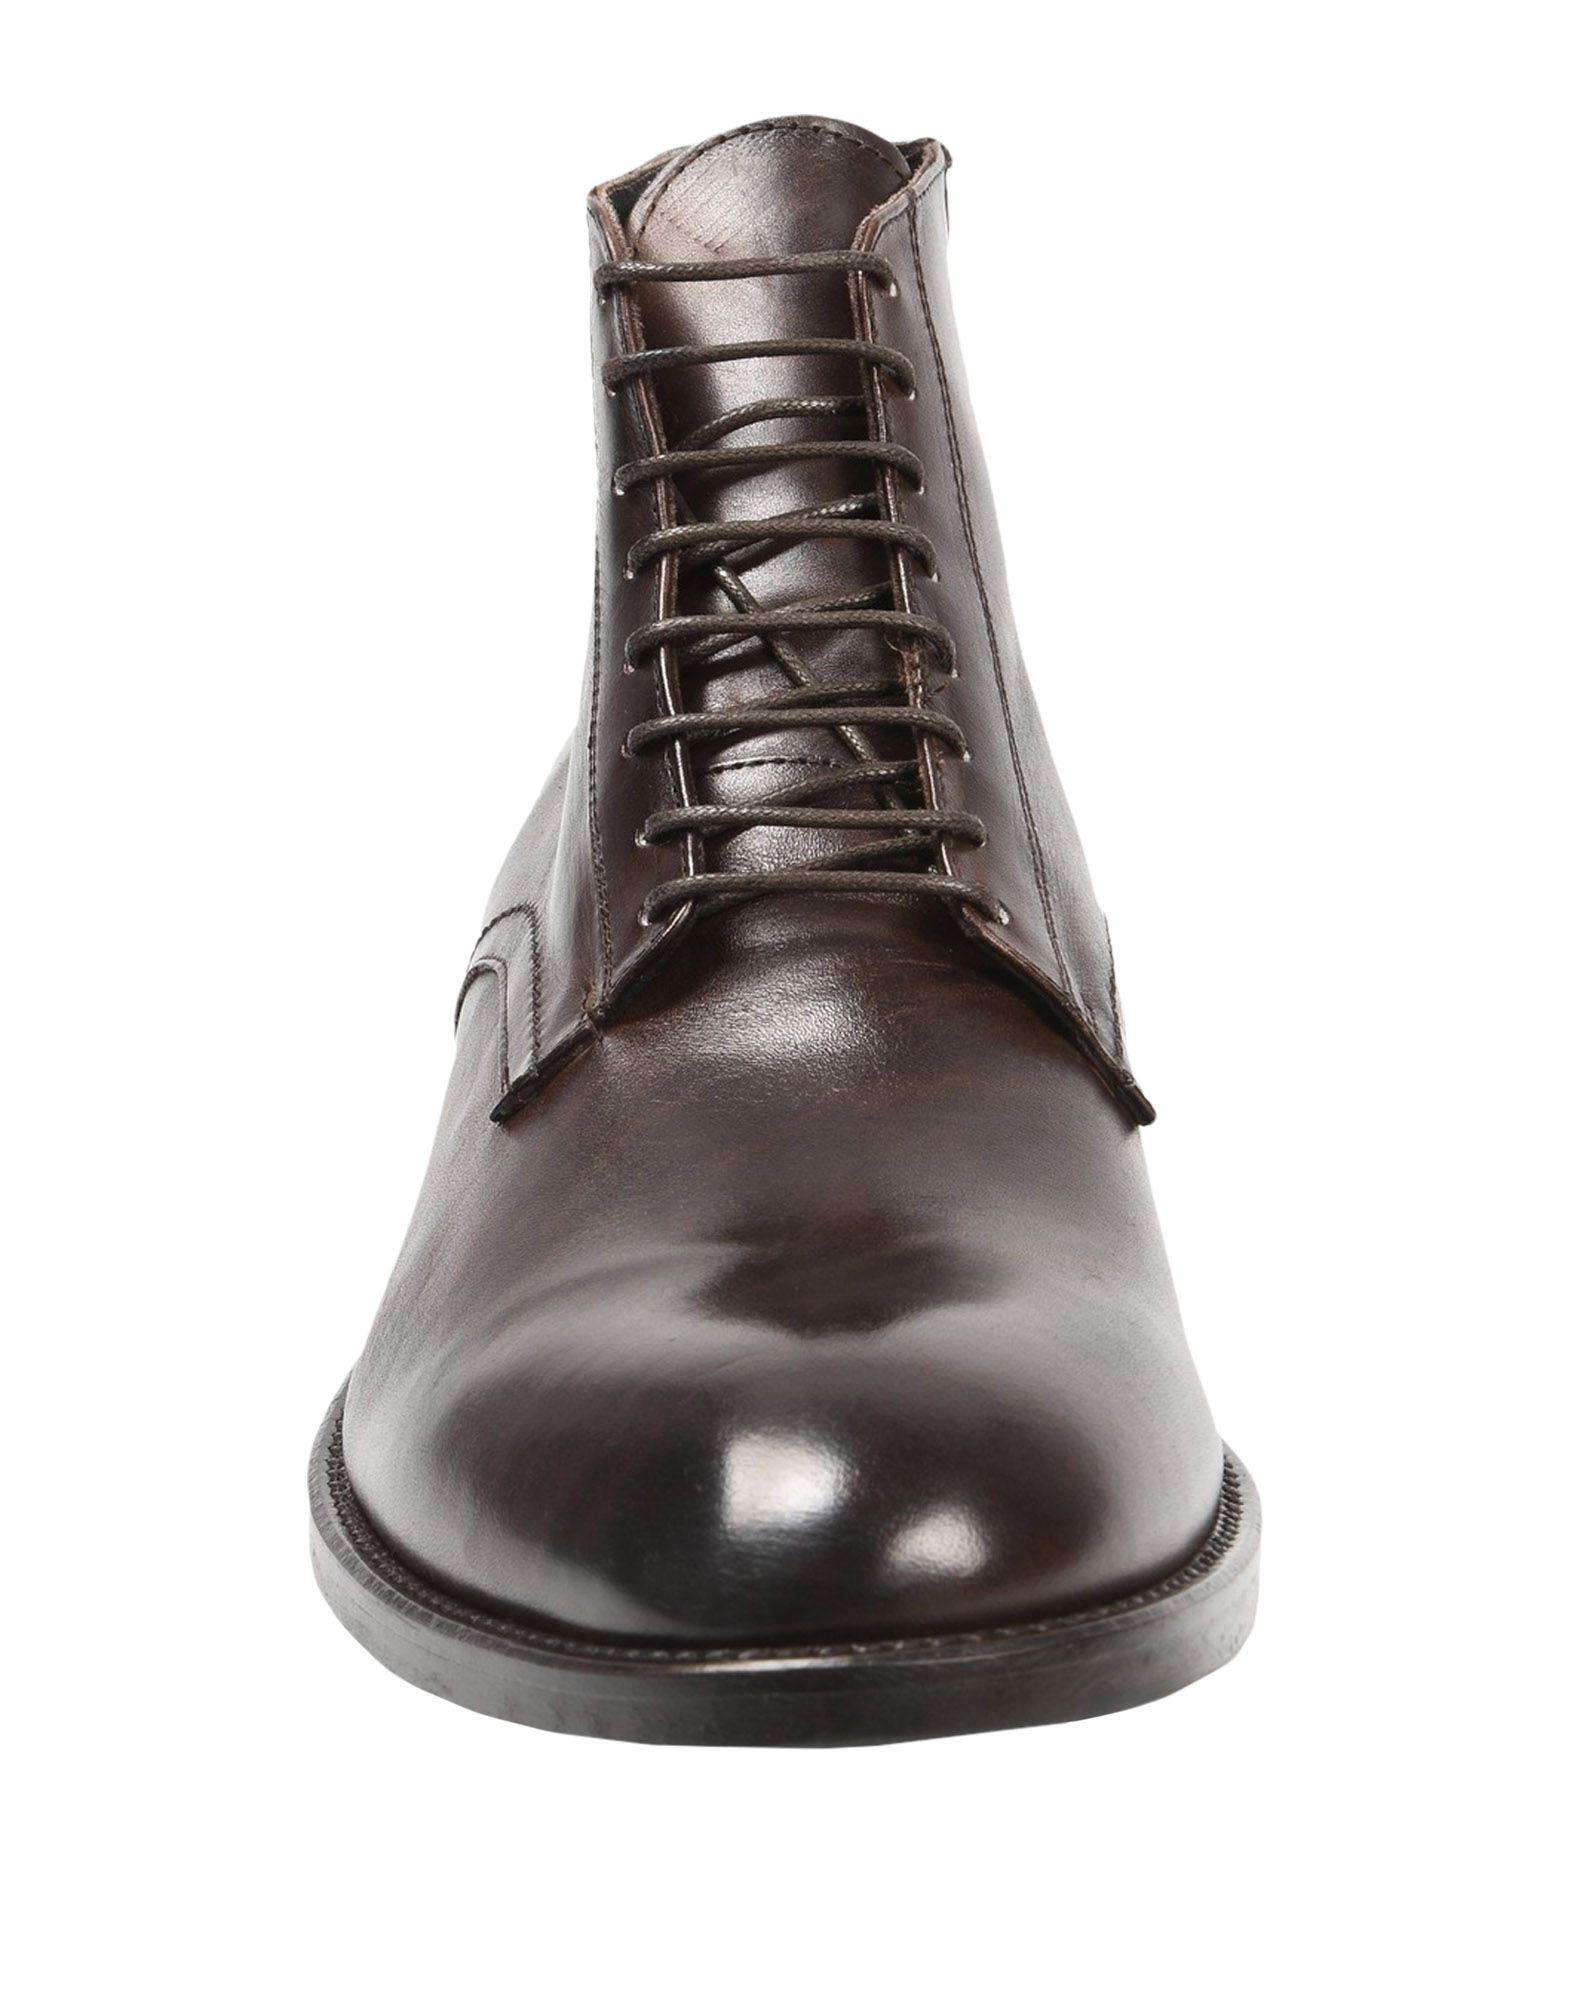 Derossi Italia Boots - Men Derossi Italia Boots Boots Boots online on  United Kingdom - 11527448WU b578cd